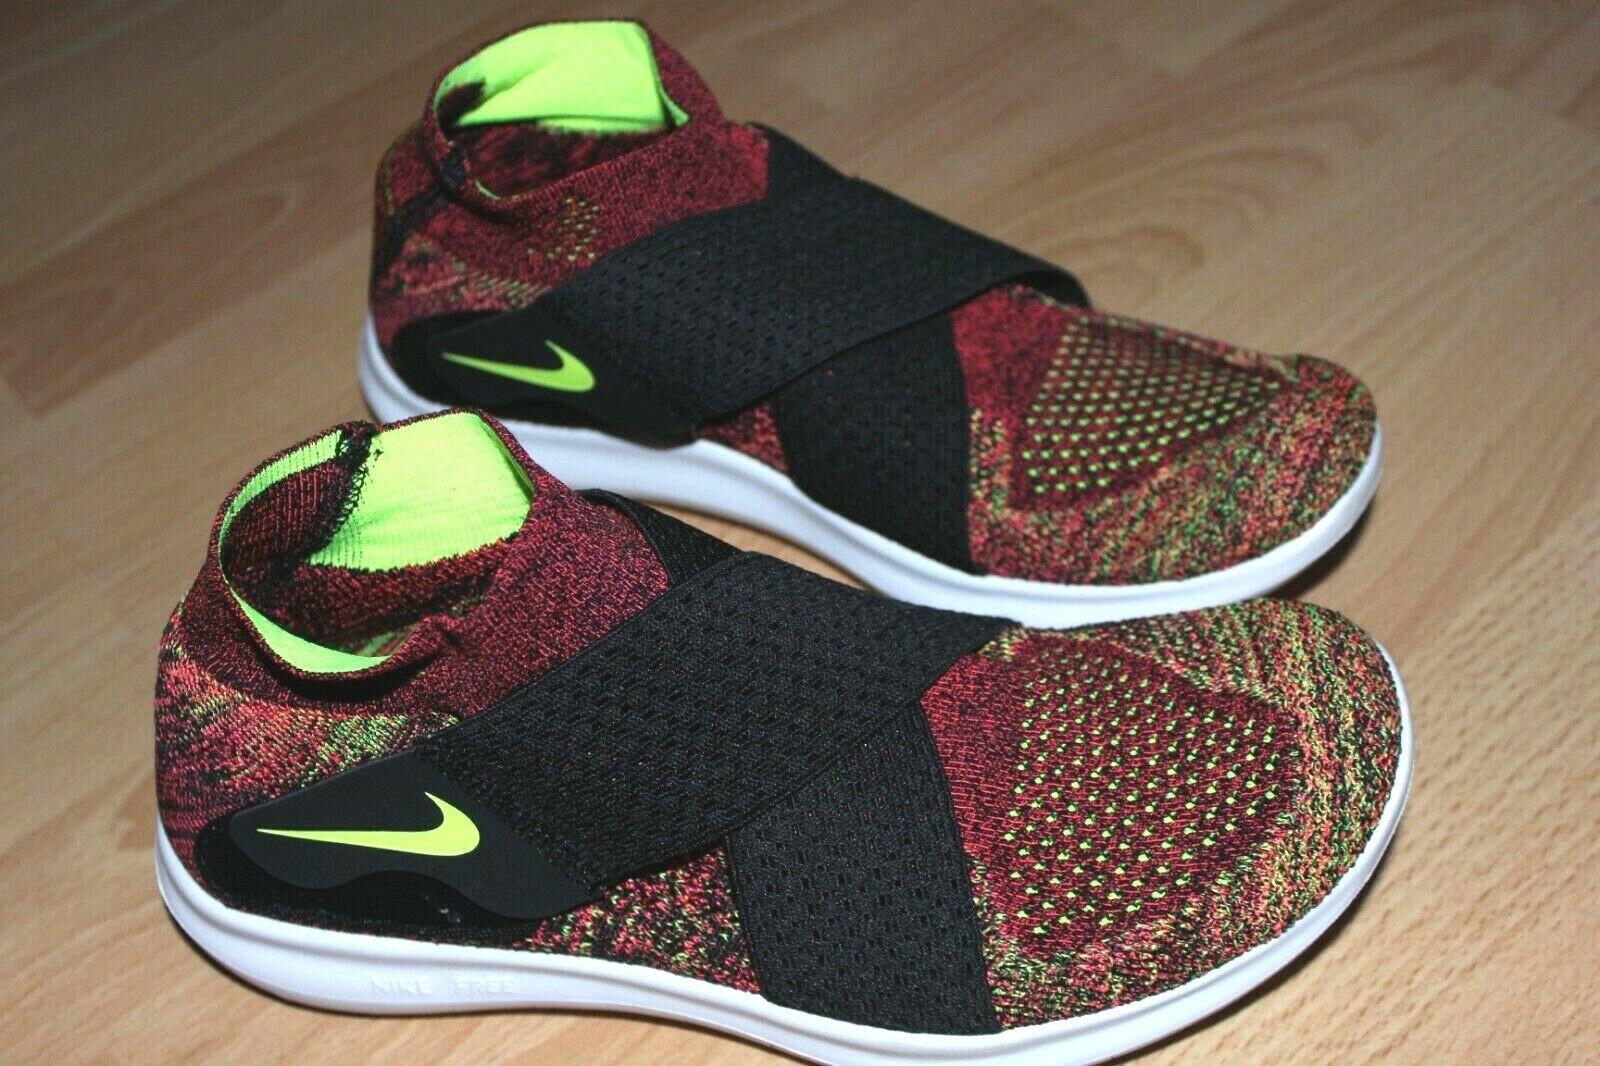 Nike SB Sneakers, Turnschuhe, Schuhe Gr. 40,5 neuwertig!